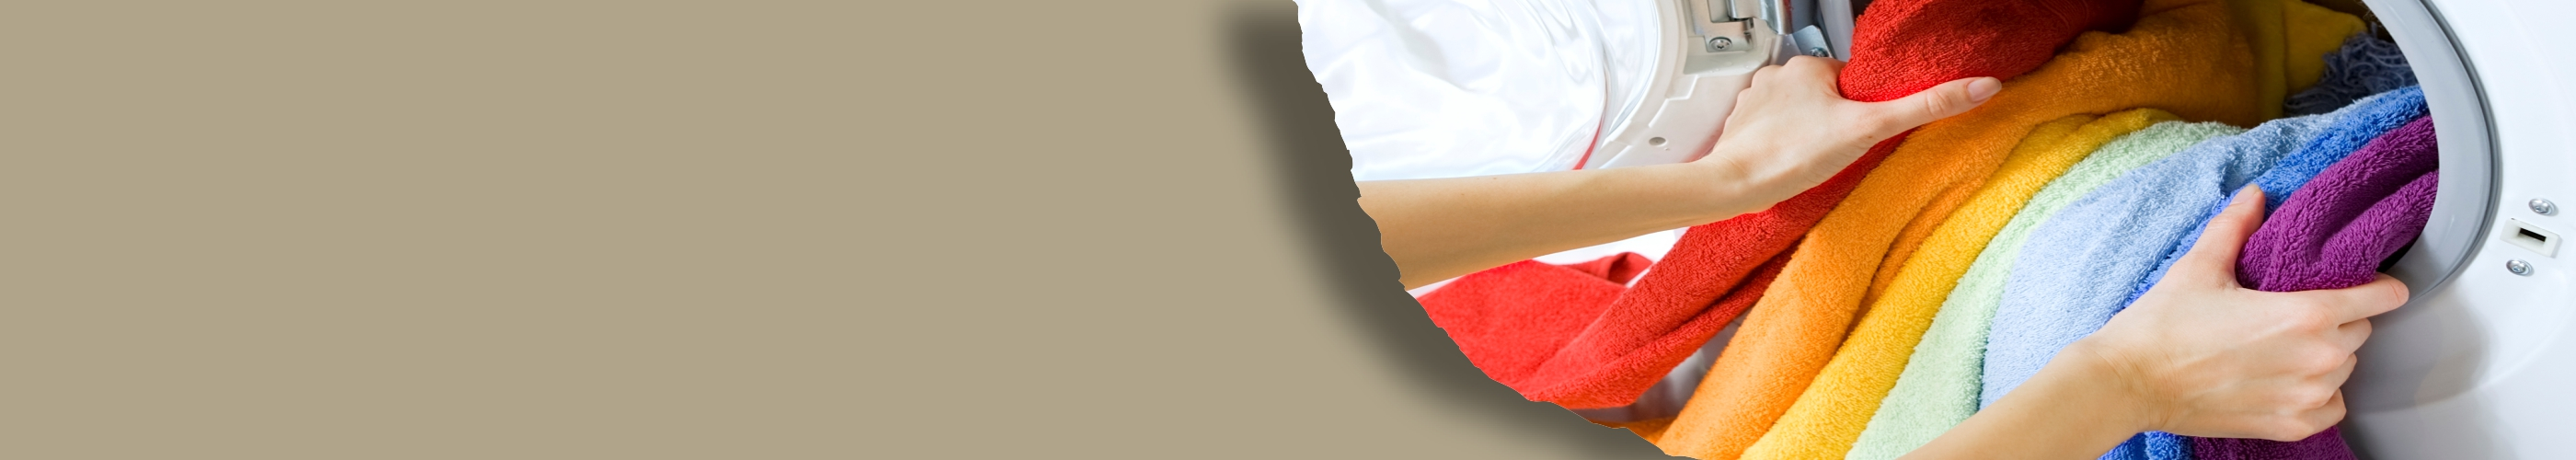 Laundrex-Banner-1400-w-x-250-1-